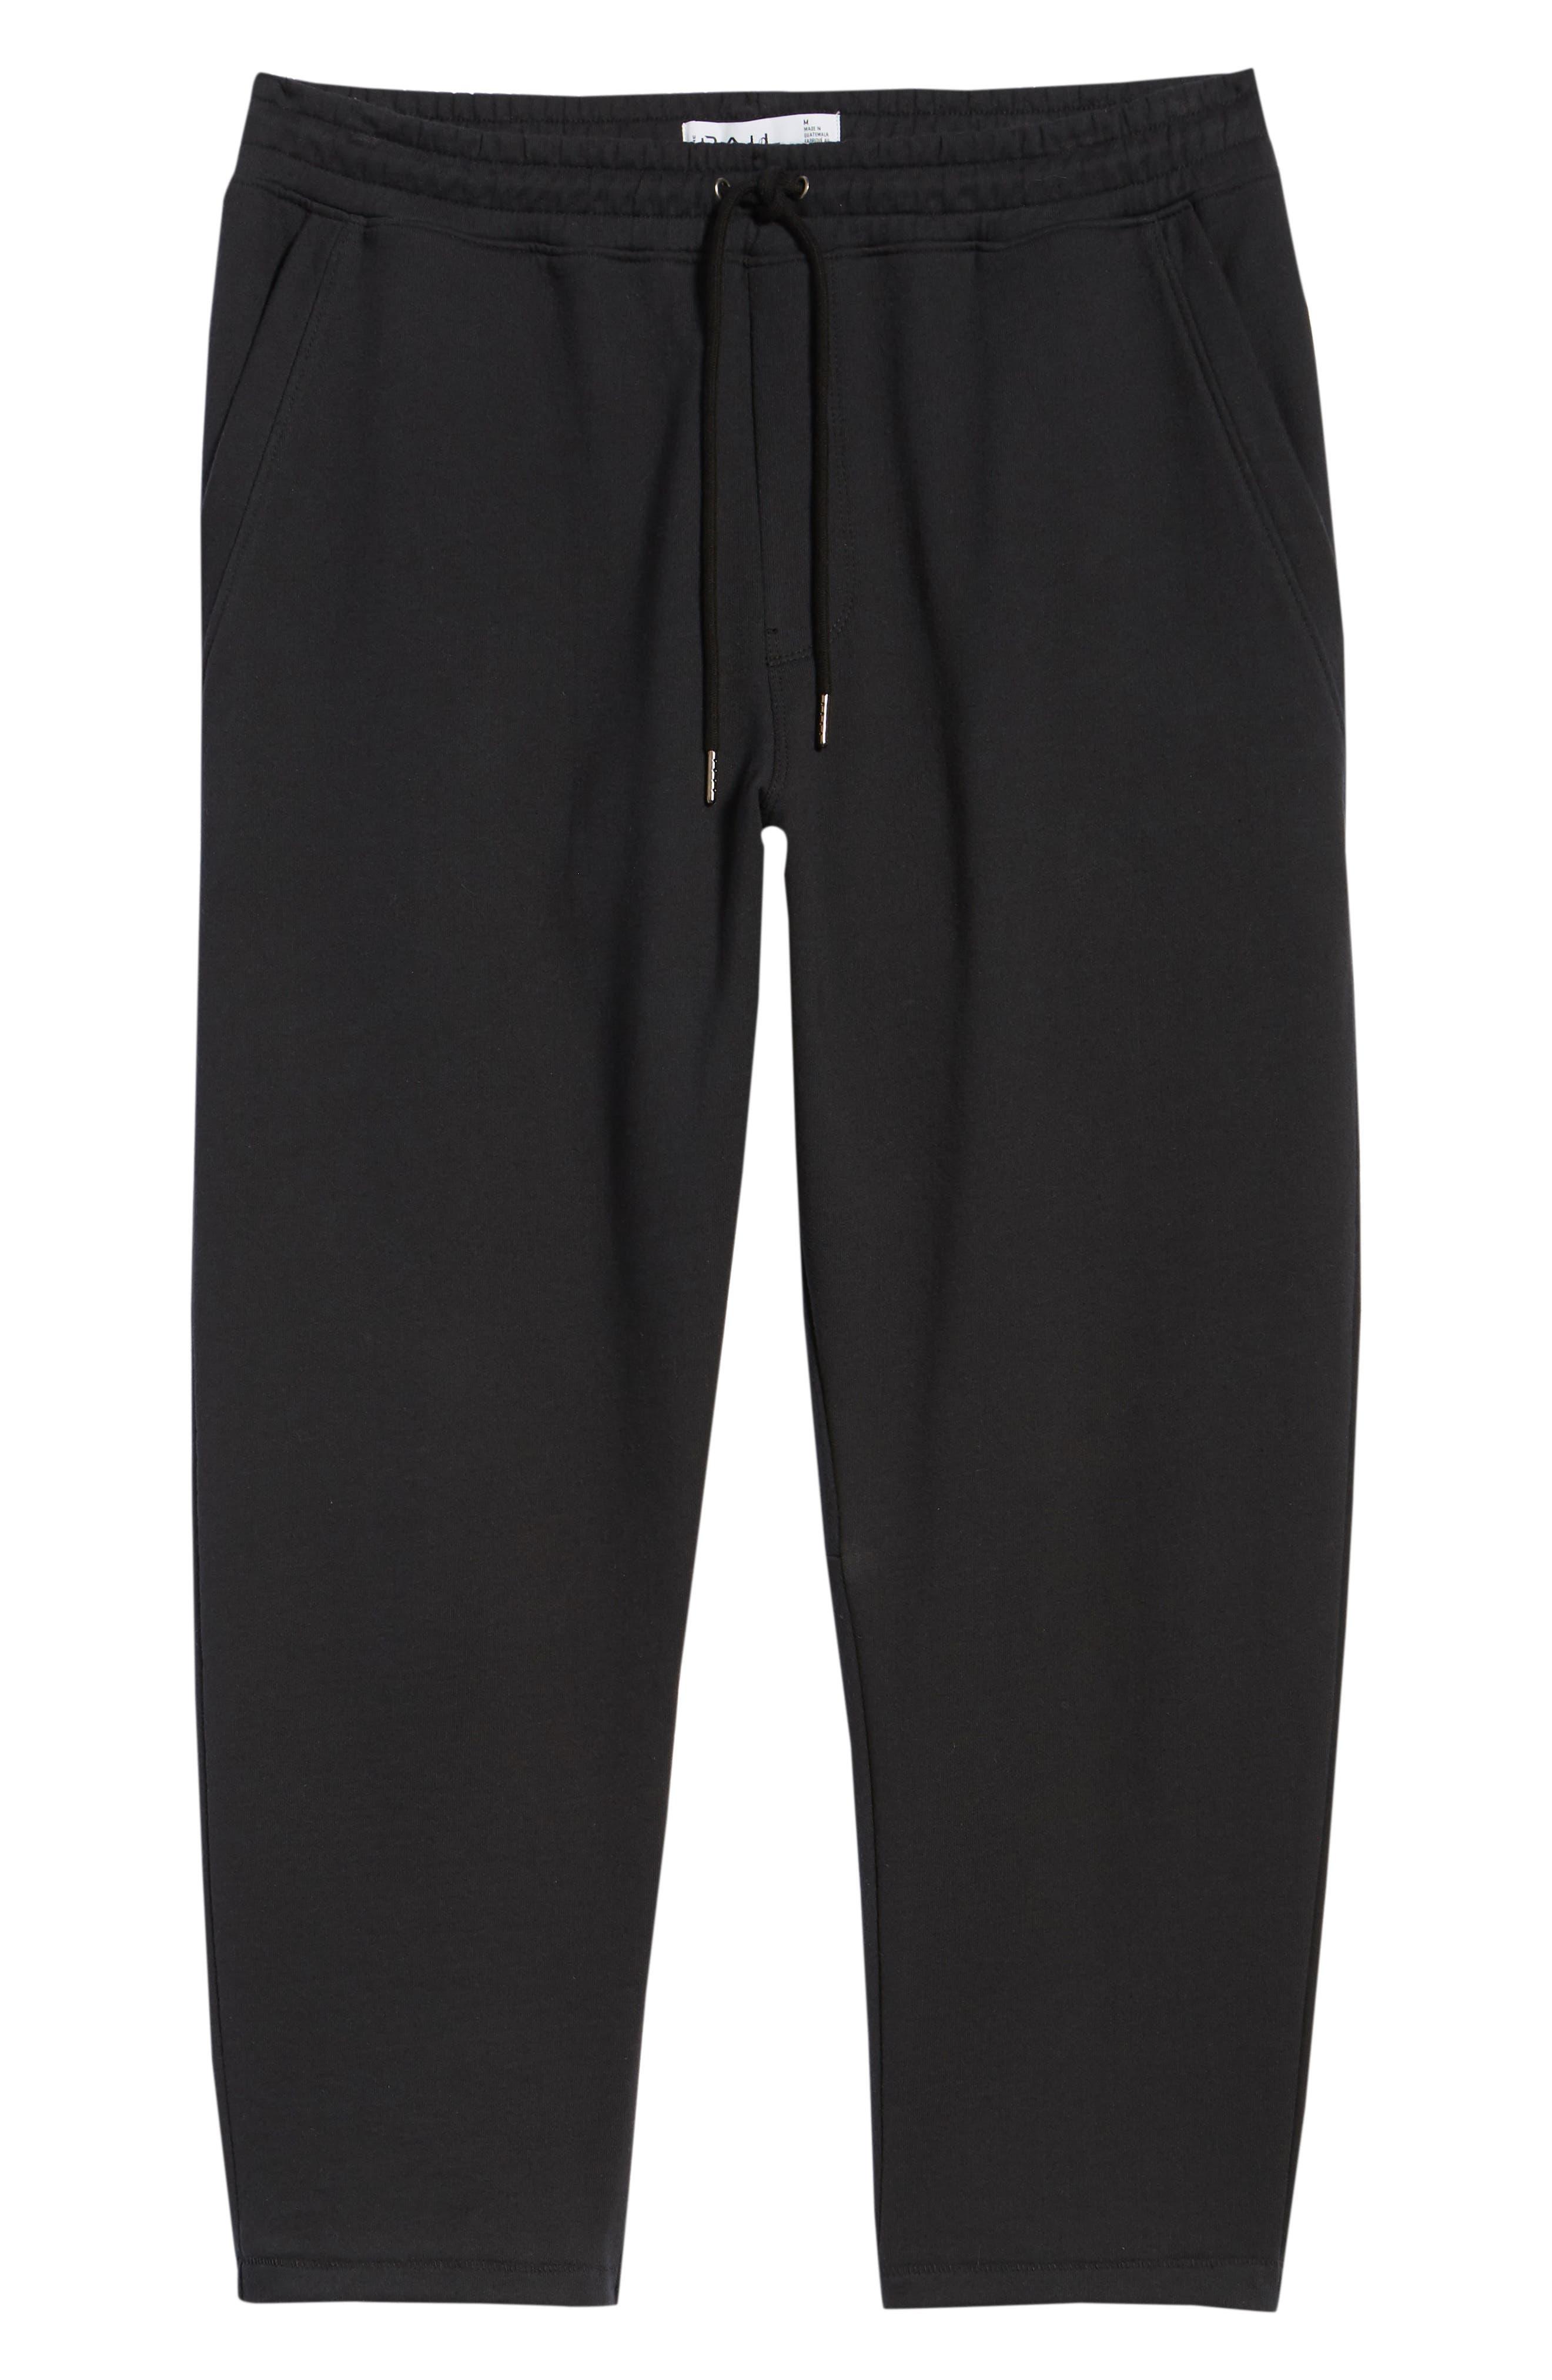 Cropped Sweatpants,                             Alternate thumbnail 6, color,                             001